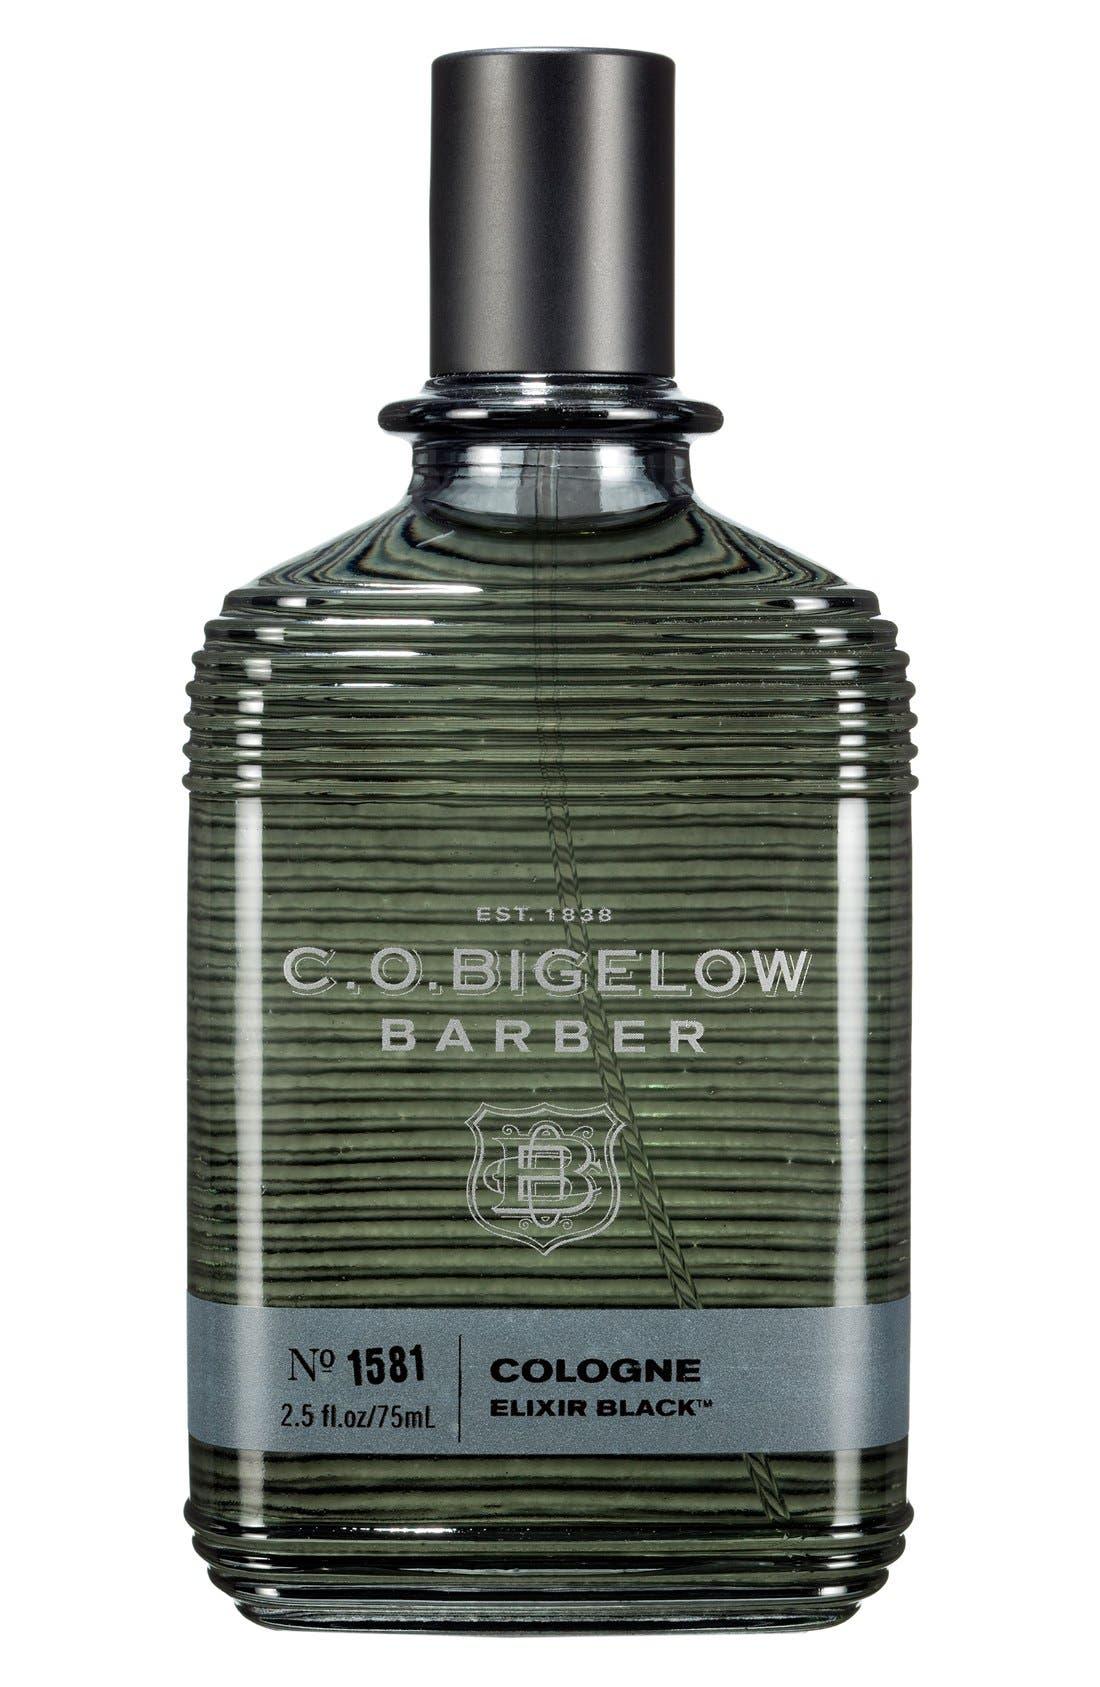 C.O. Bigelow® 'Barber - Elixir White' Cologne